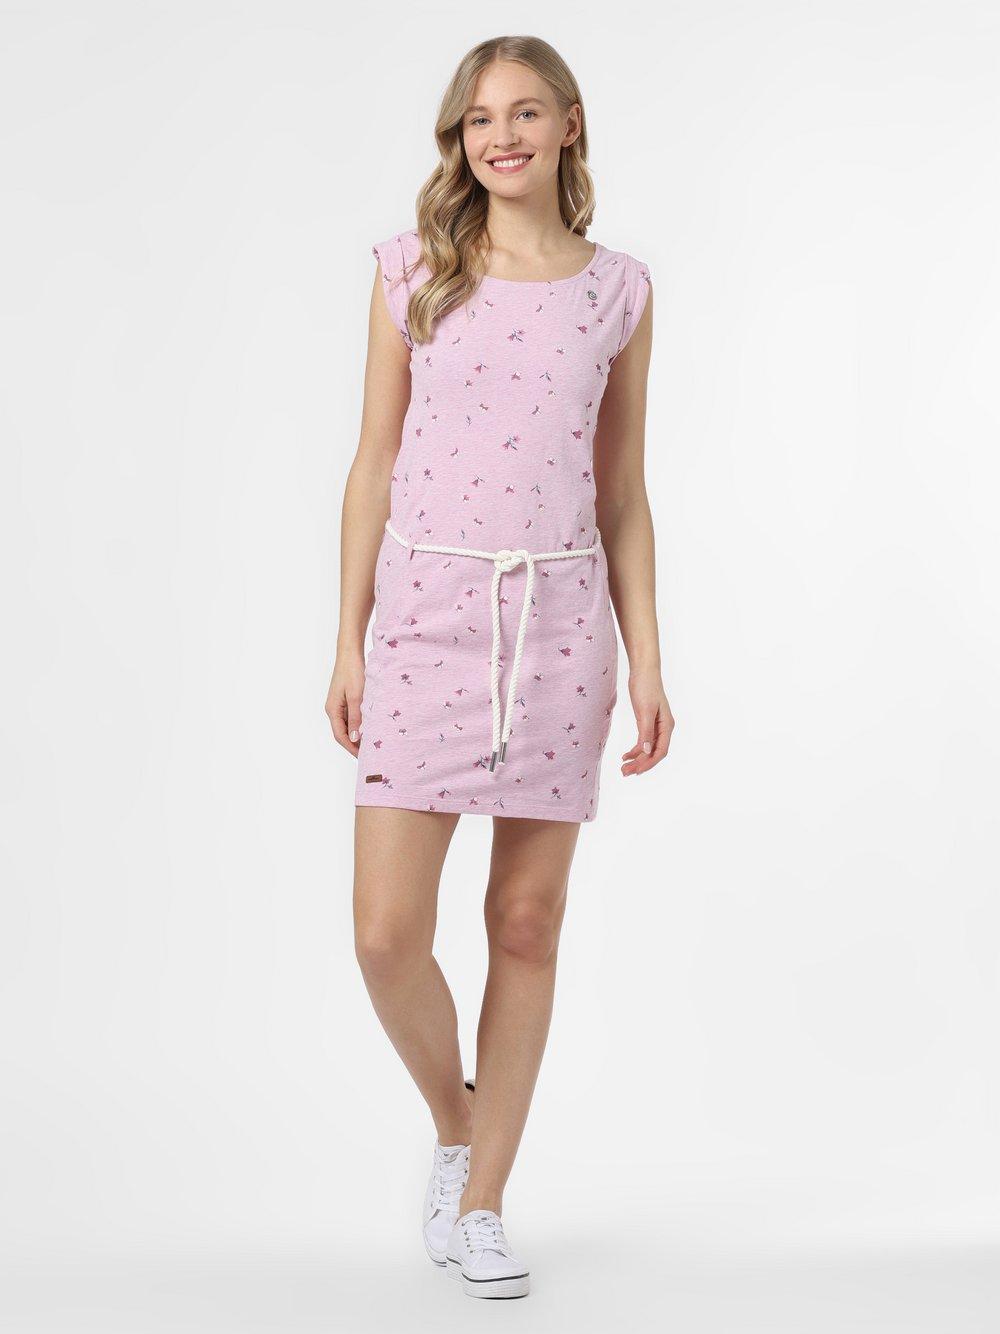 Ragwear – Sukienka damska – Tamy, różowy Van Graaf 467432-0001-09920